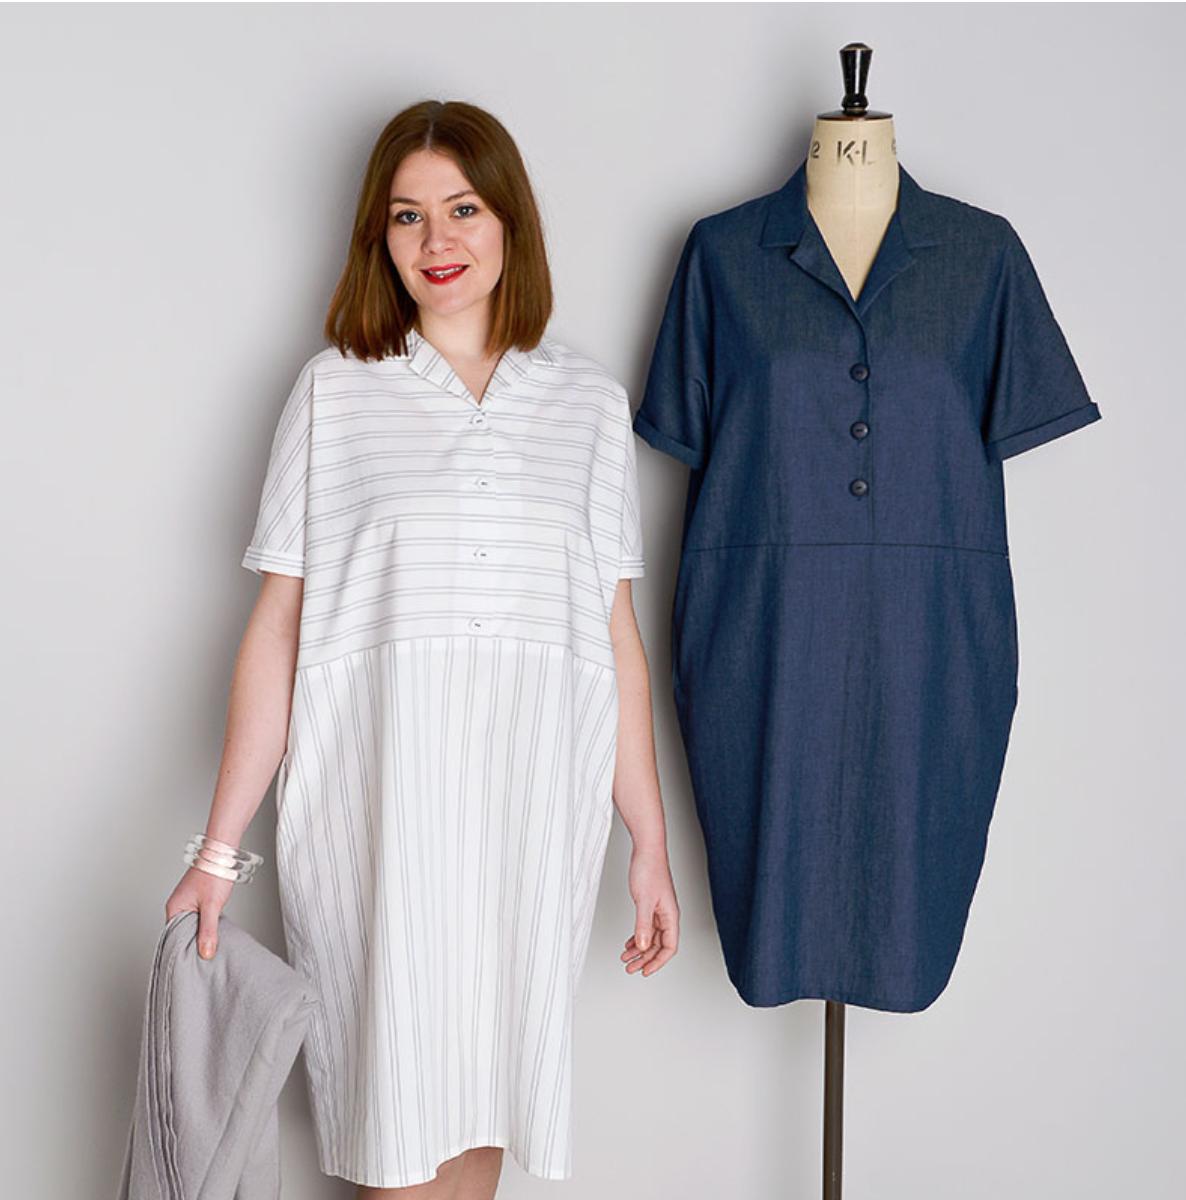 10 shirt dress sewing patterns for summer - The Foldline